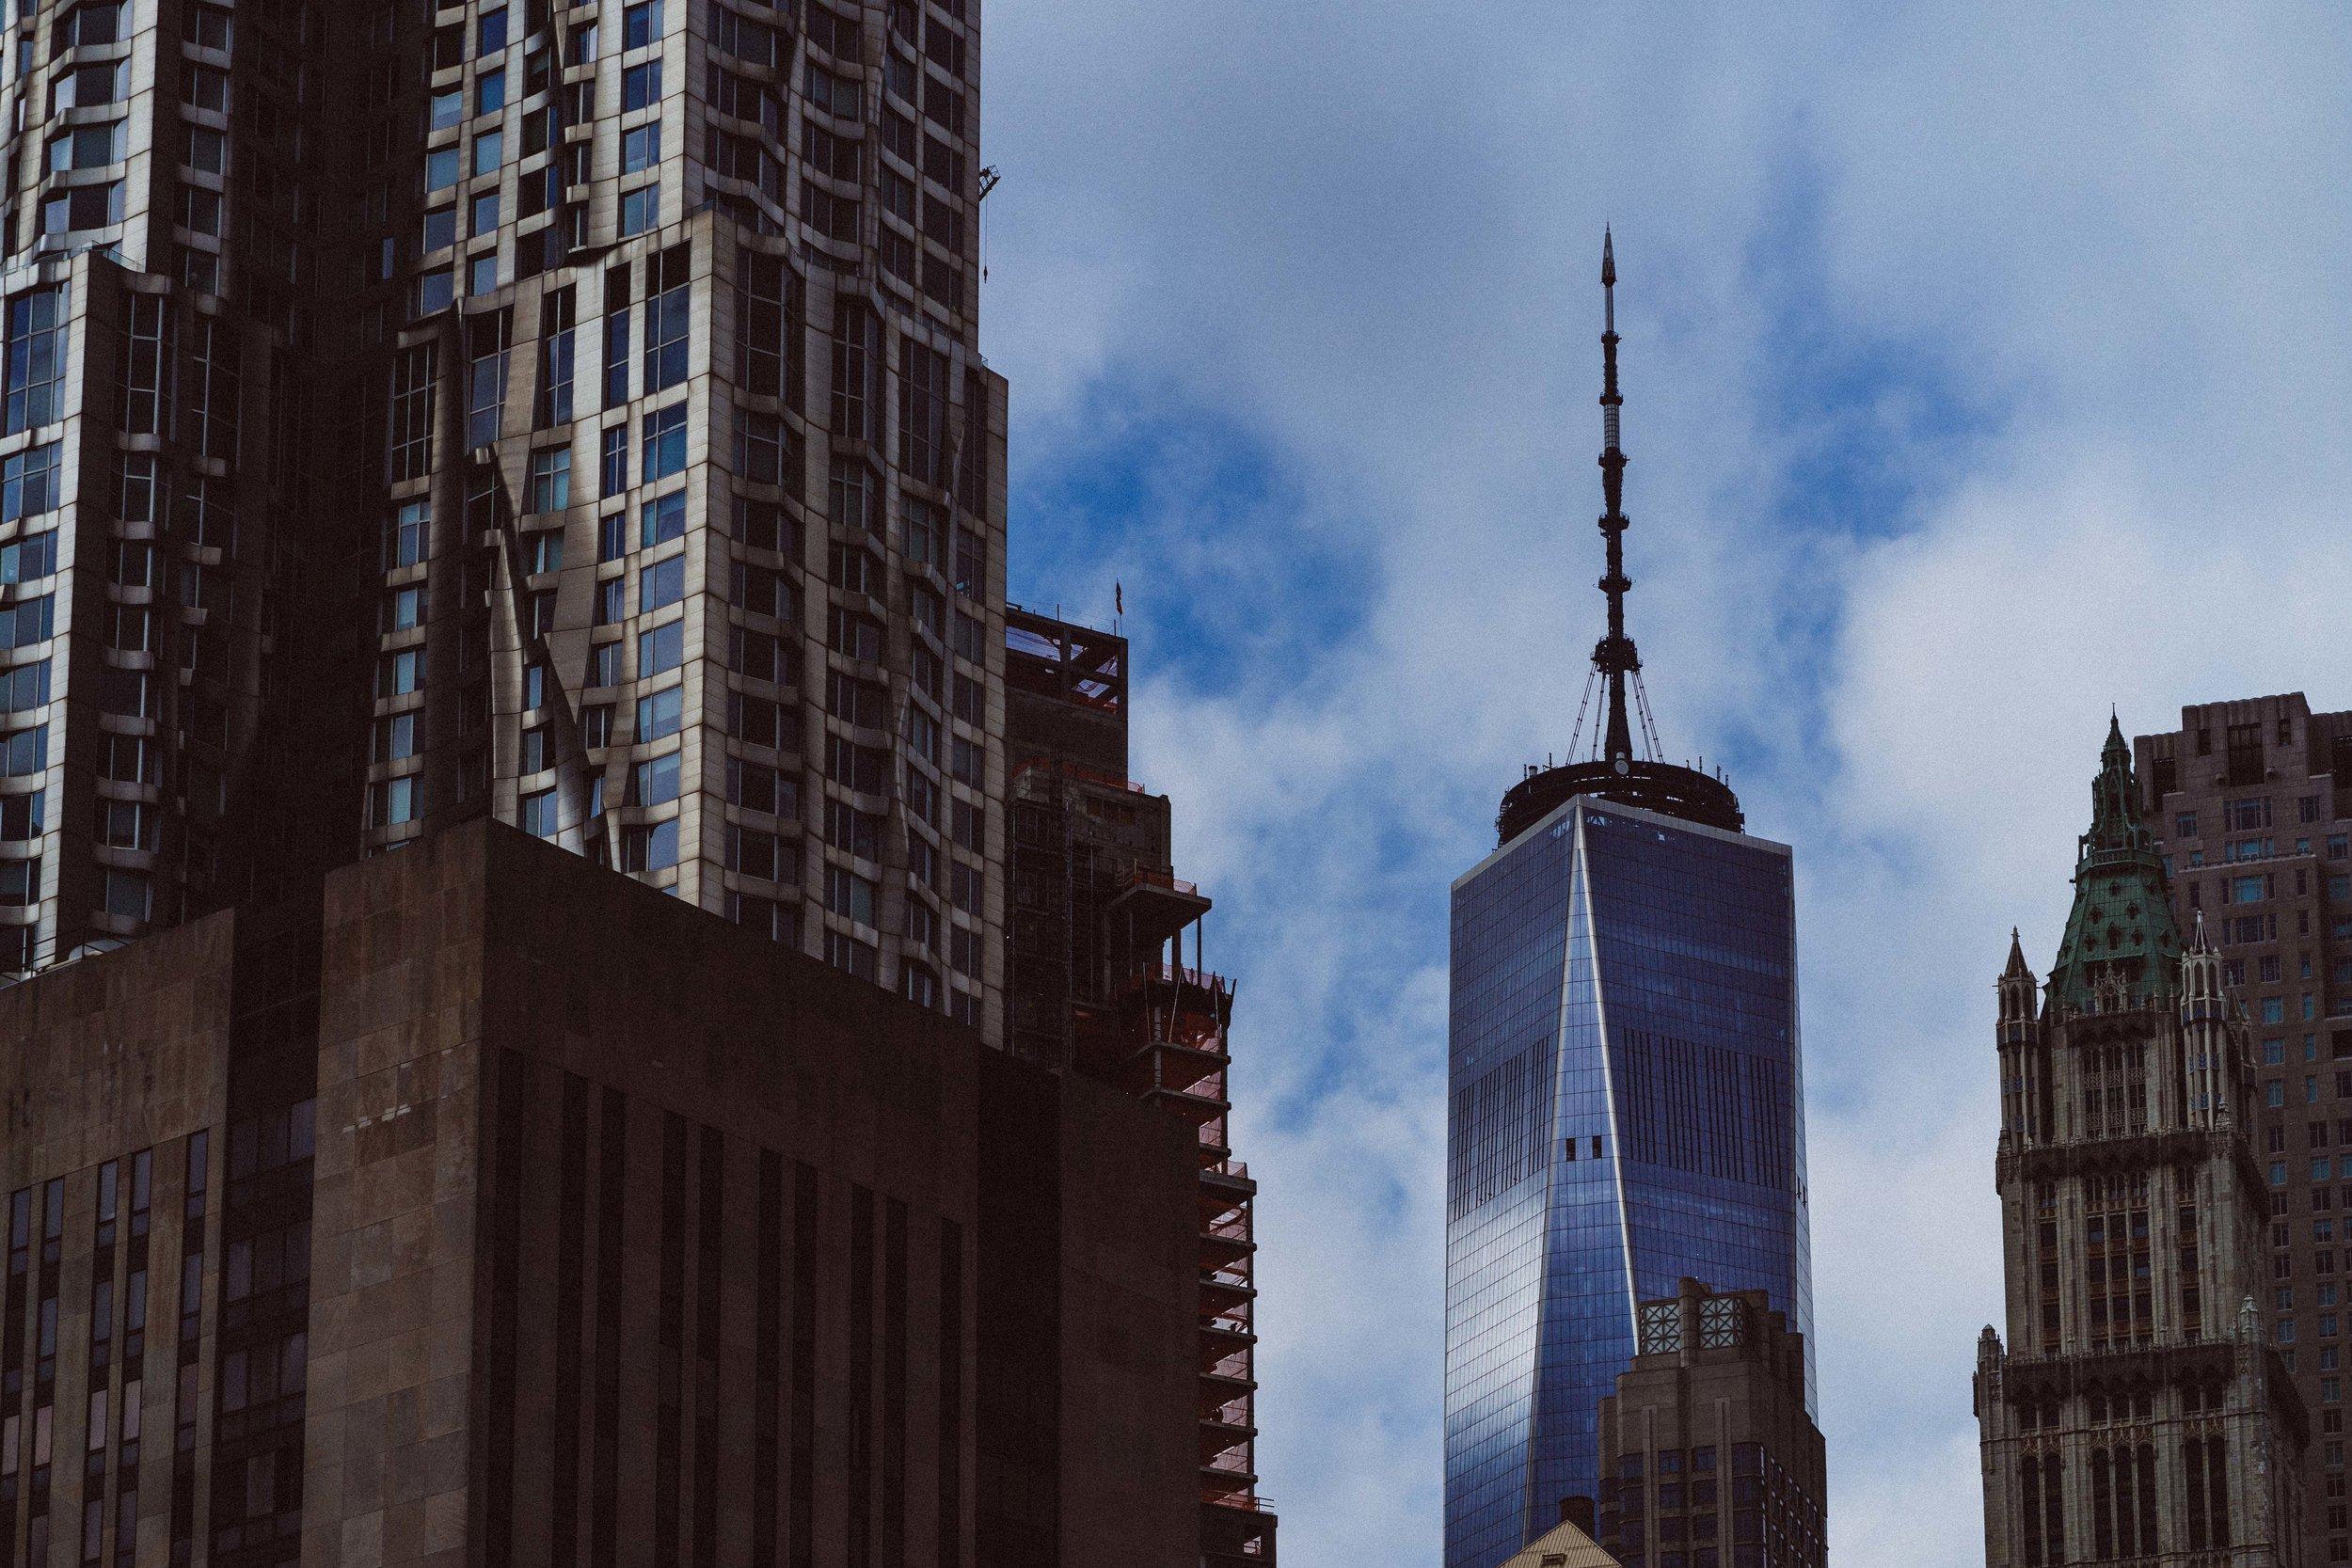 newyork-sony-102316.jpg